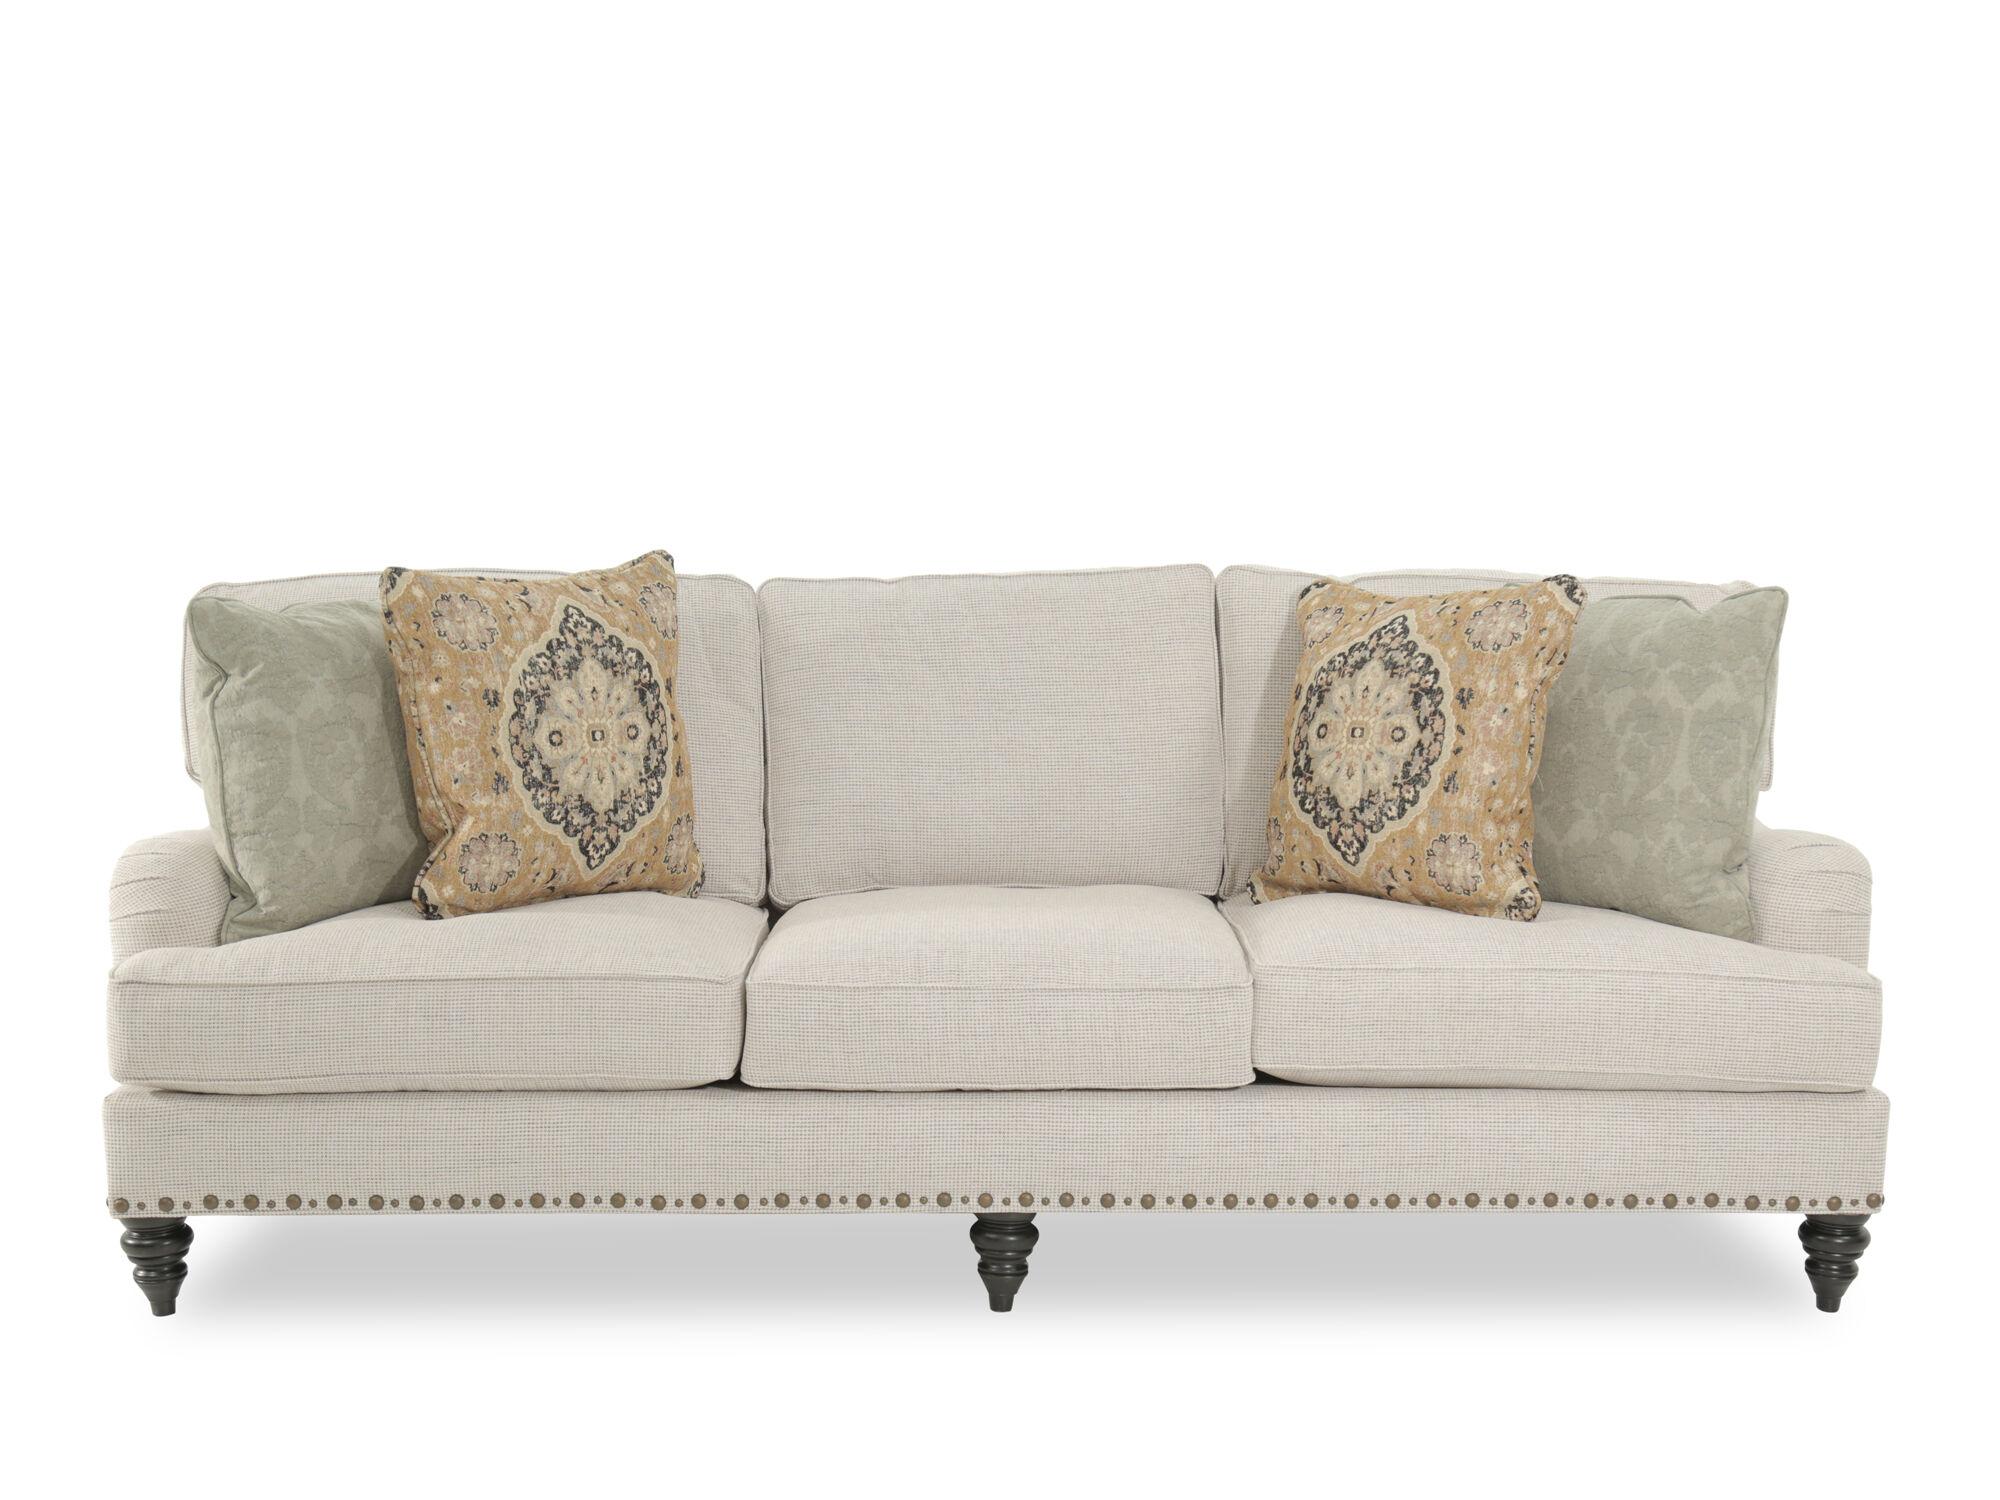 Traditional Nailhead Accented 99u0026quot; Sofa In Cream